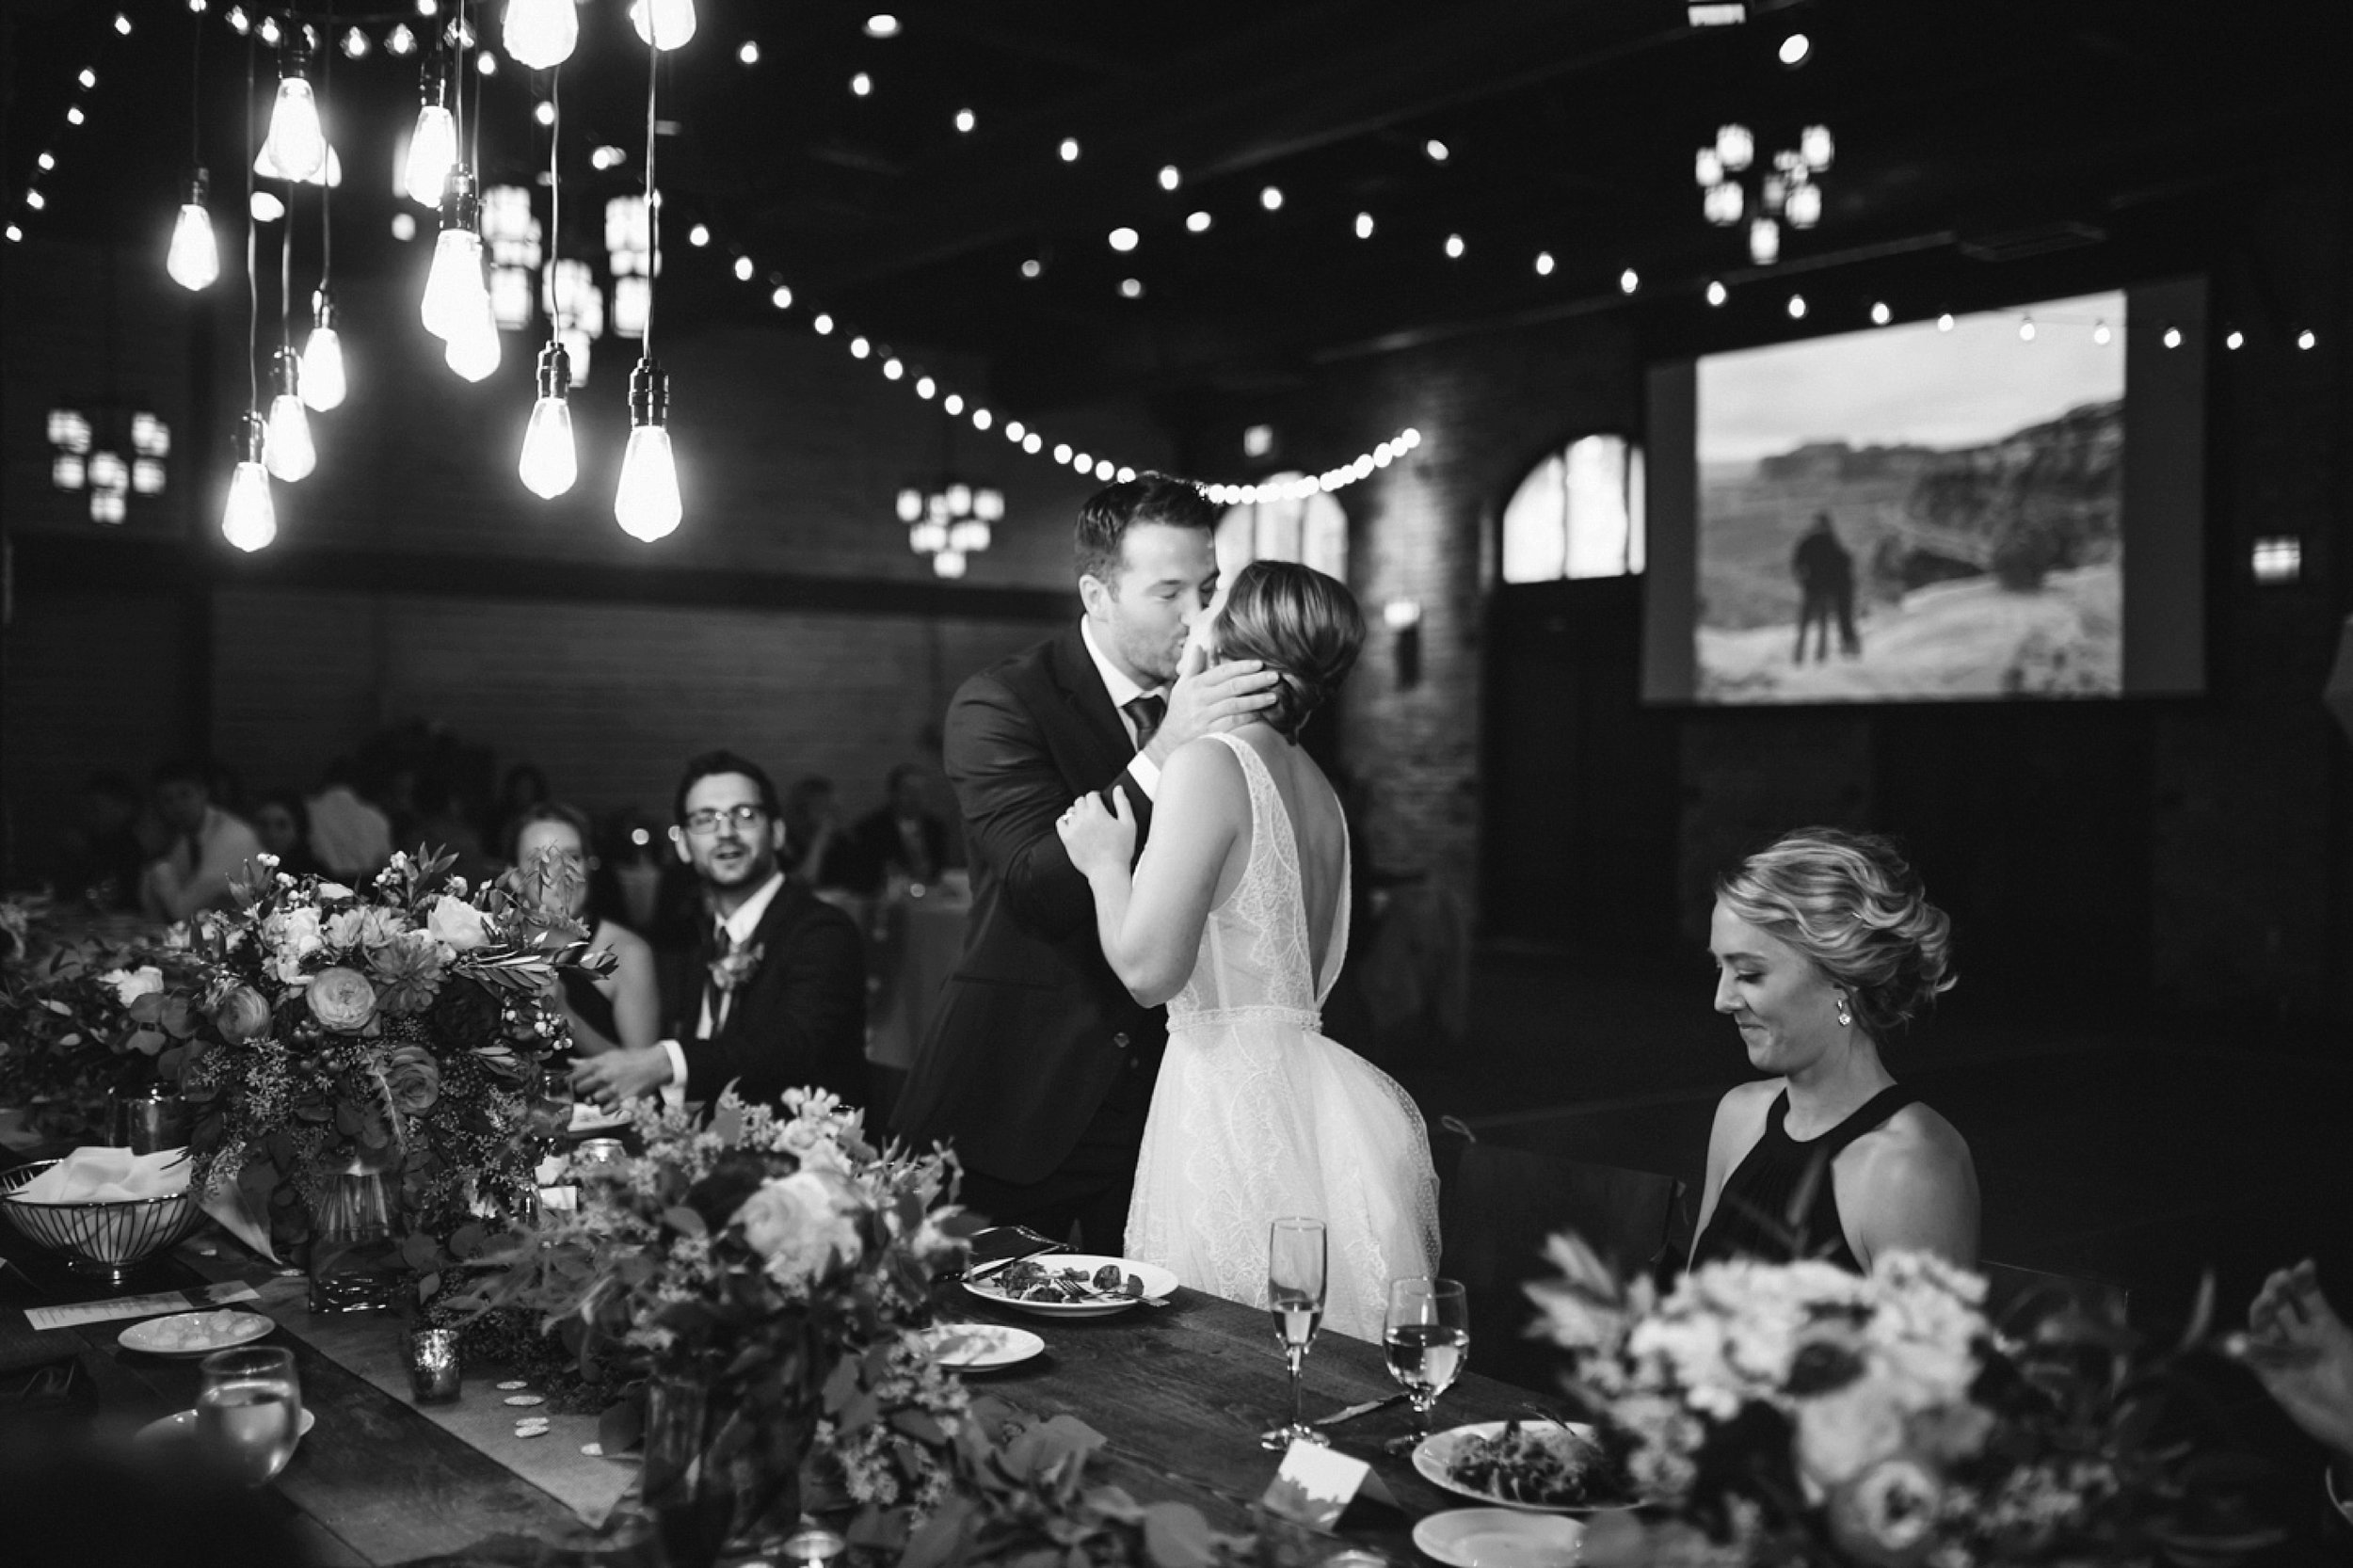 Nicollet-Island-Pavilion-Minneapolis-September-Coral-Navy-Wedding-144.jpg